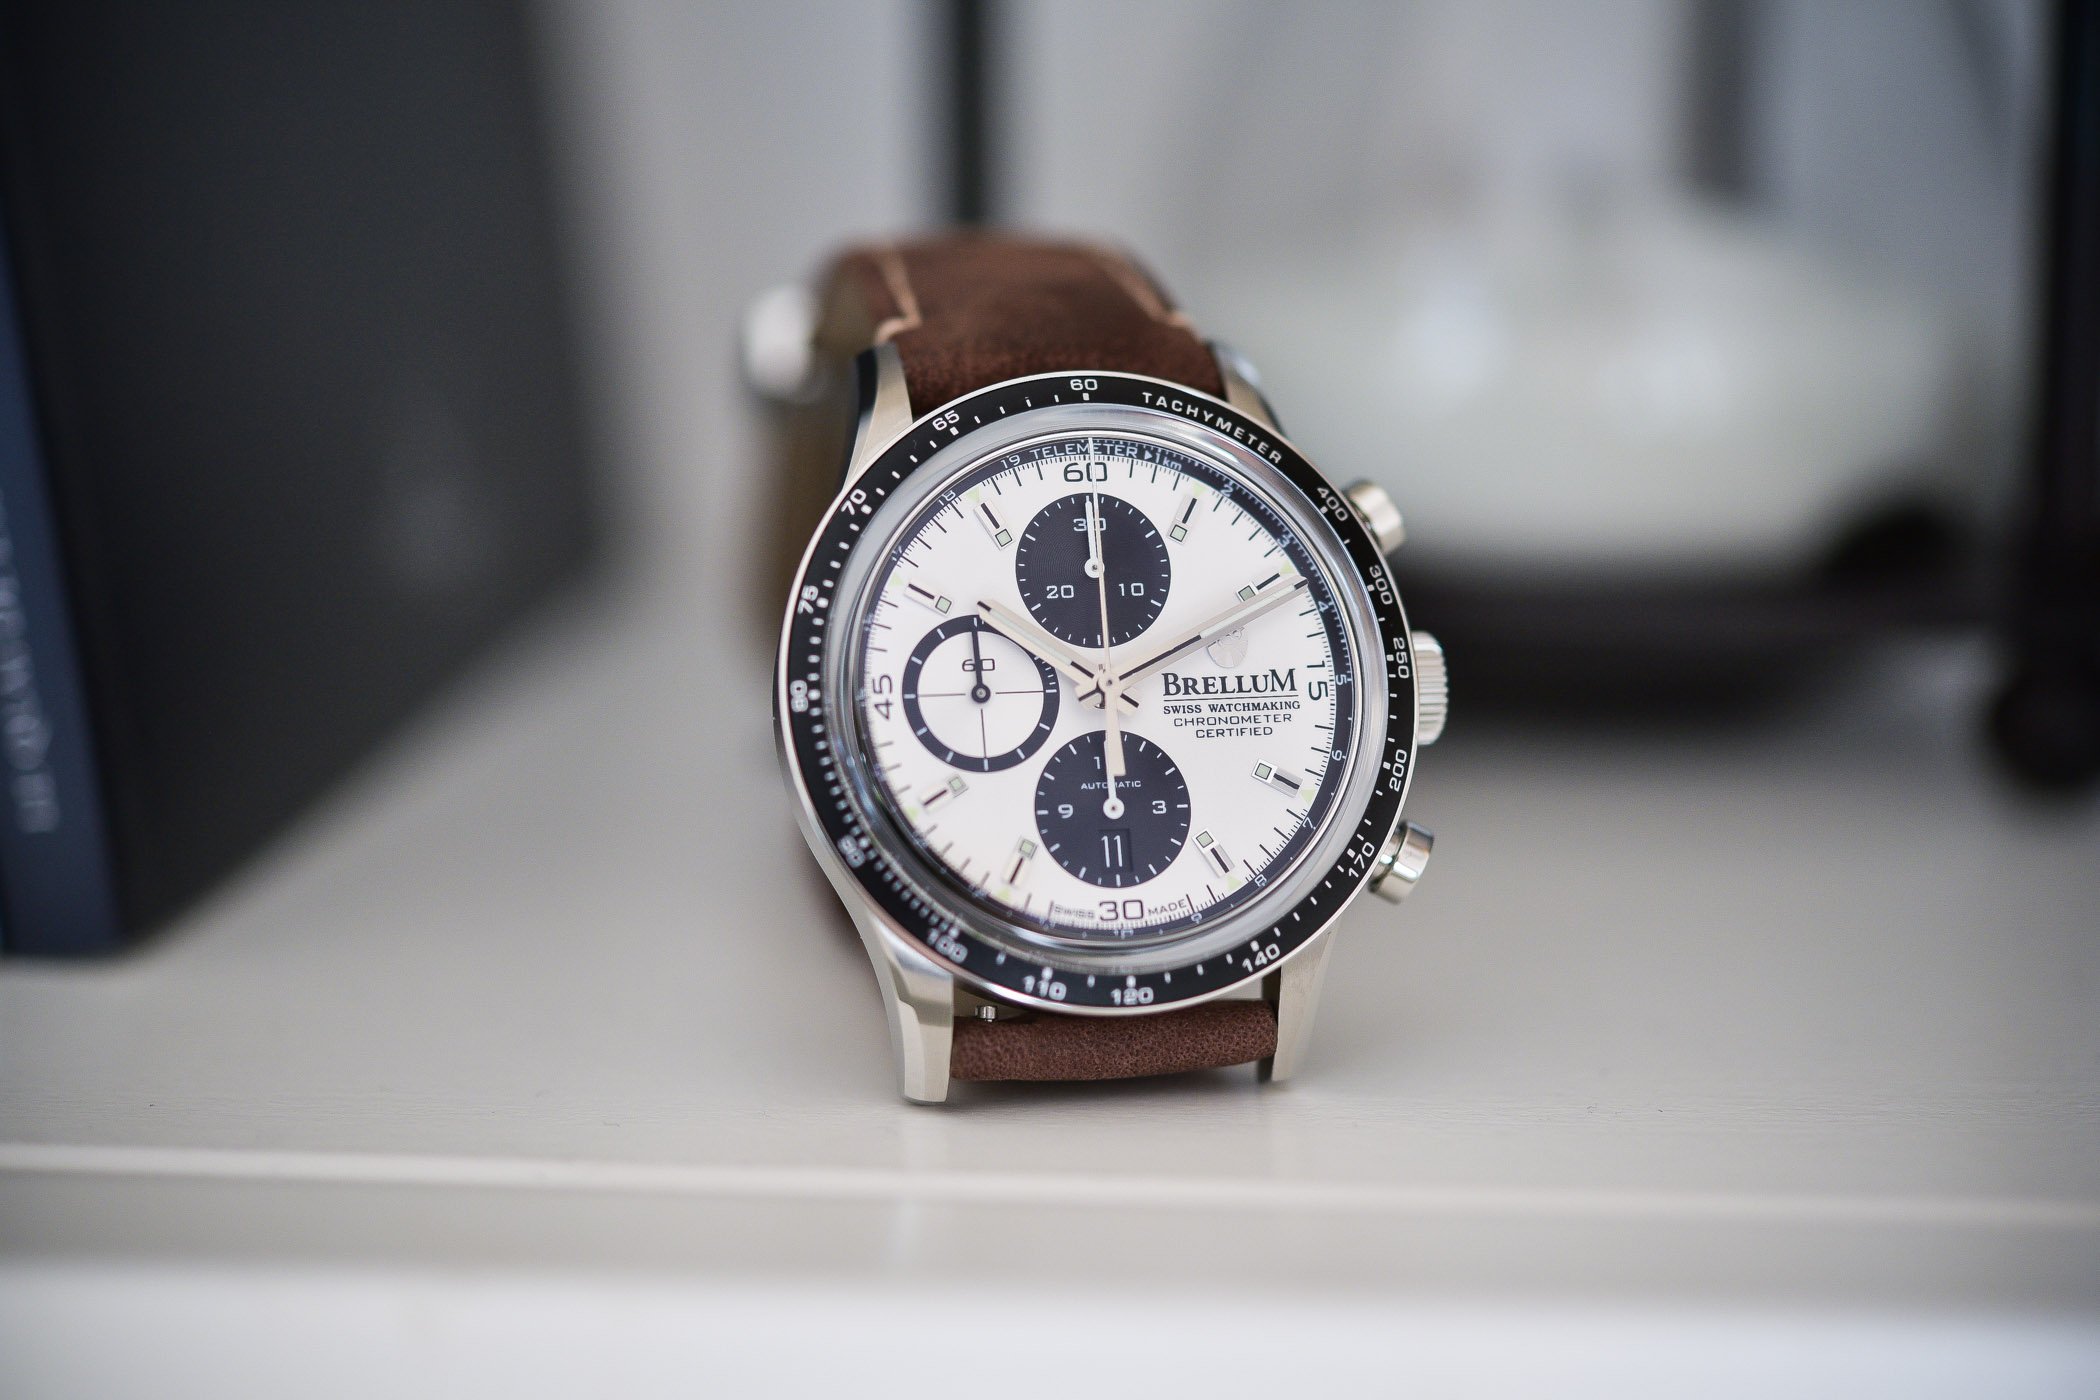 Brellum Duobox Pandial Chronograph